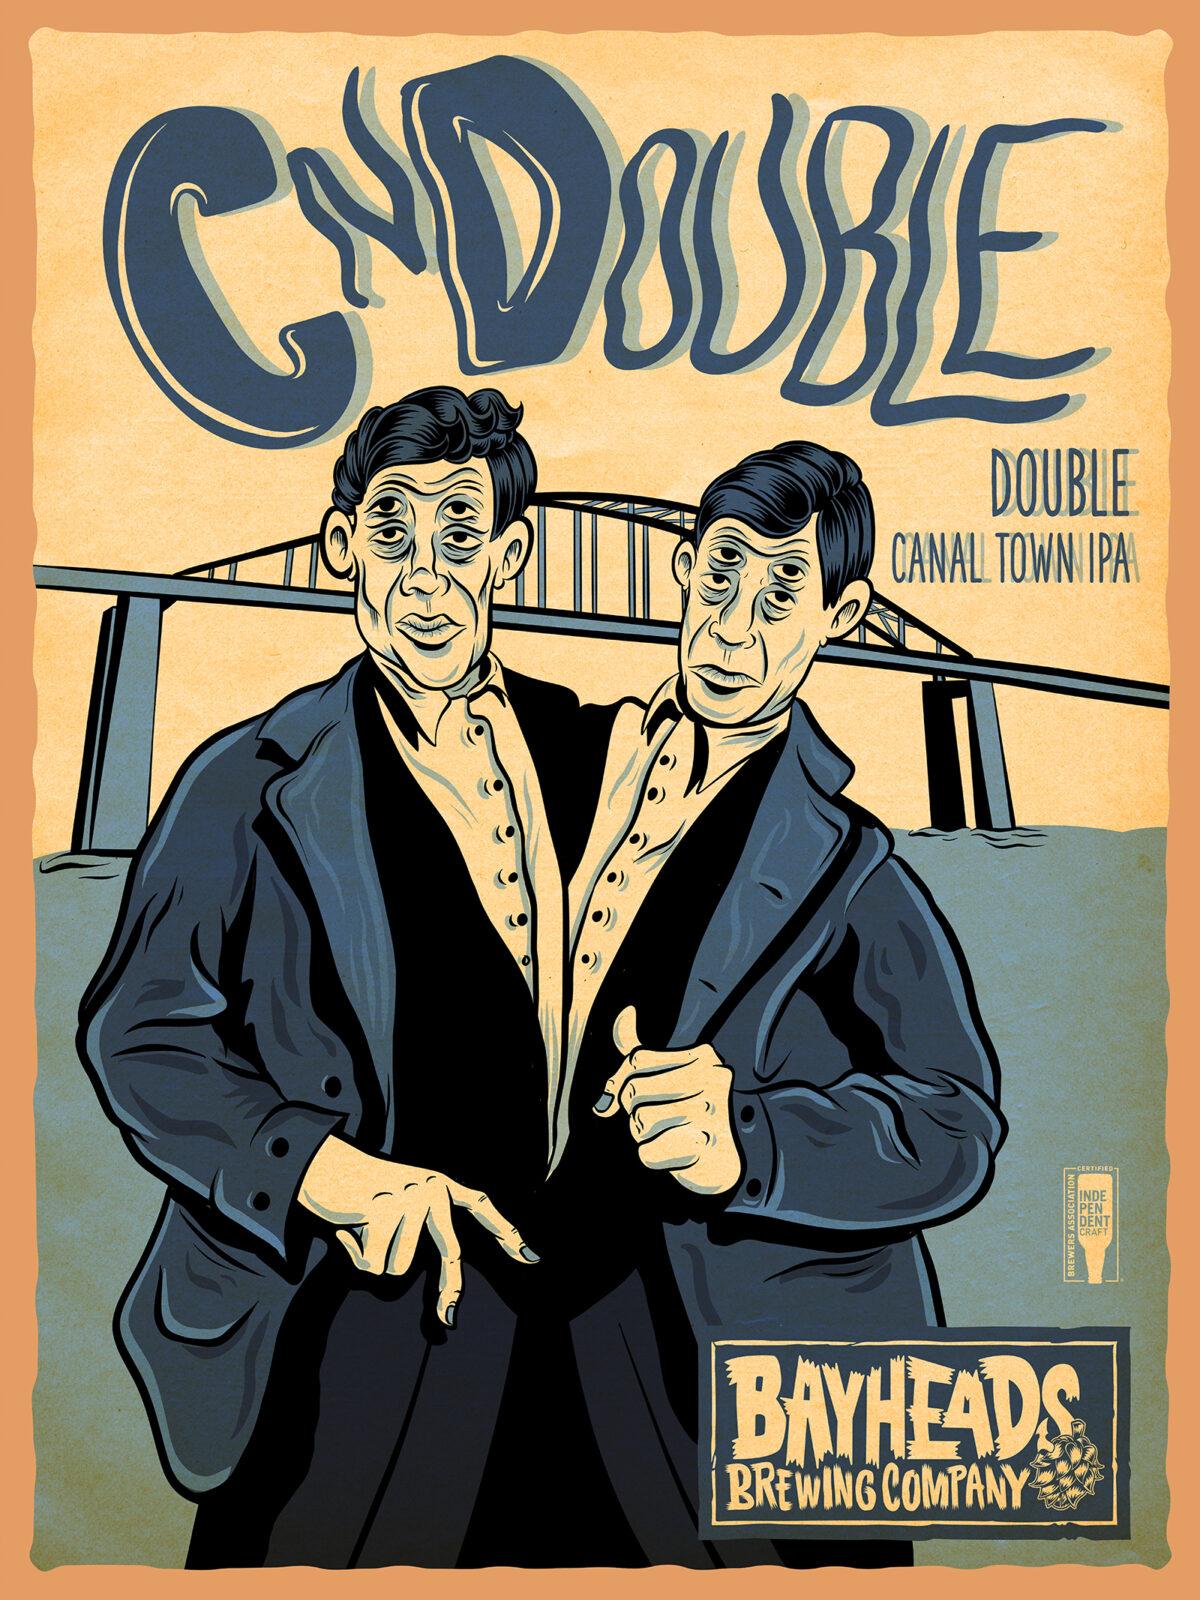 CnDouble IPA – Bayheads Brewing Company